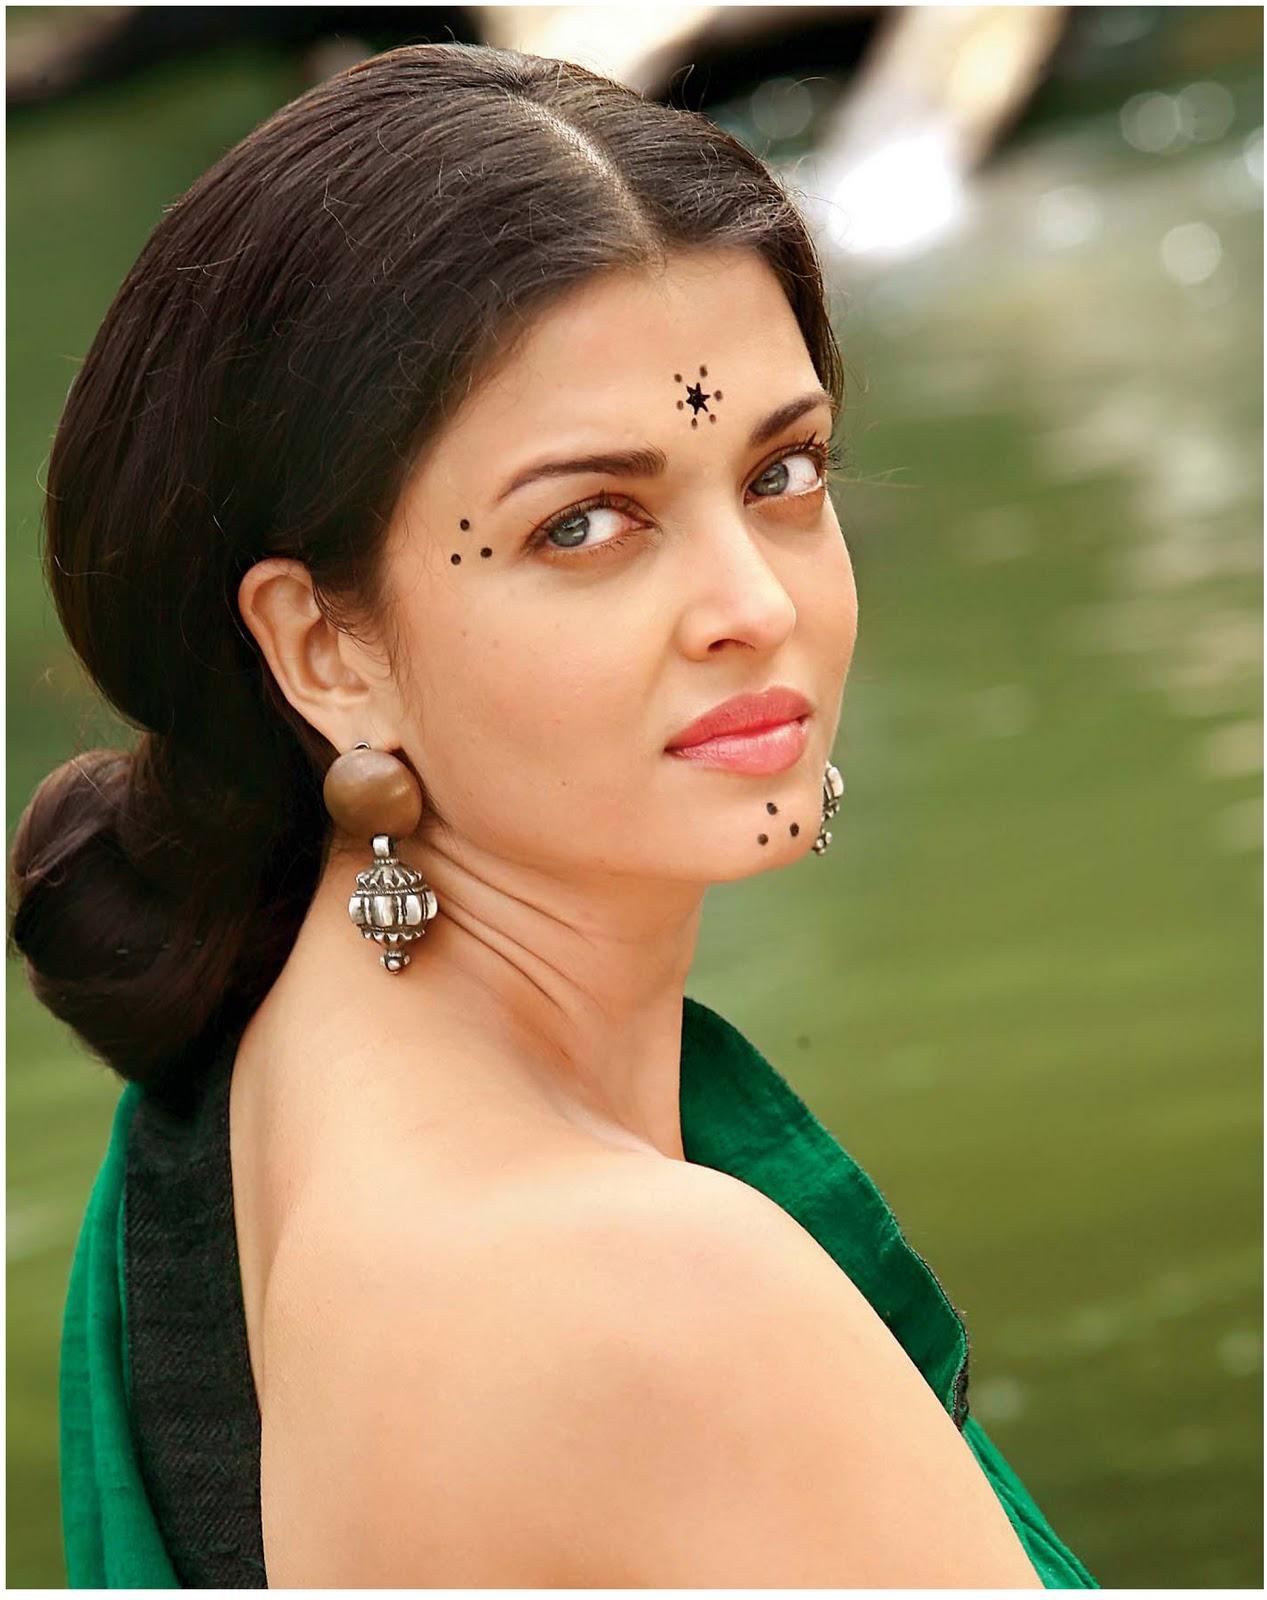 http://3.bp.blogspot.com/-6VGUOHdgIYs/Tp2ELPNd-oI/AAAAAAAAAG4/HqUtCovfyp8/s1600/aishwarya-rai-sexy-backless-saree-pictures.jpg